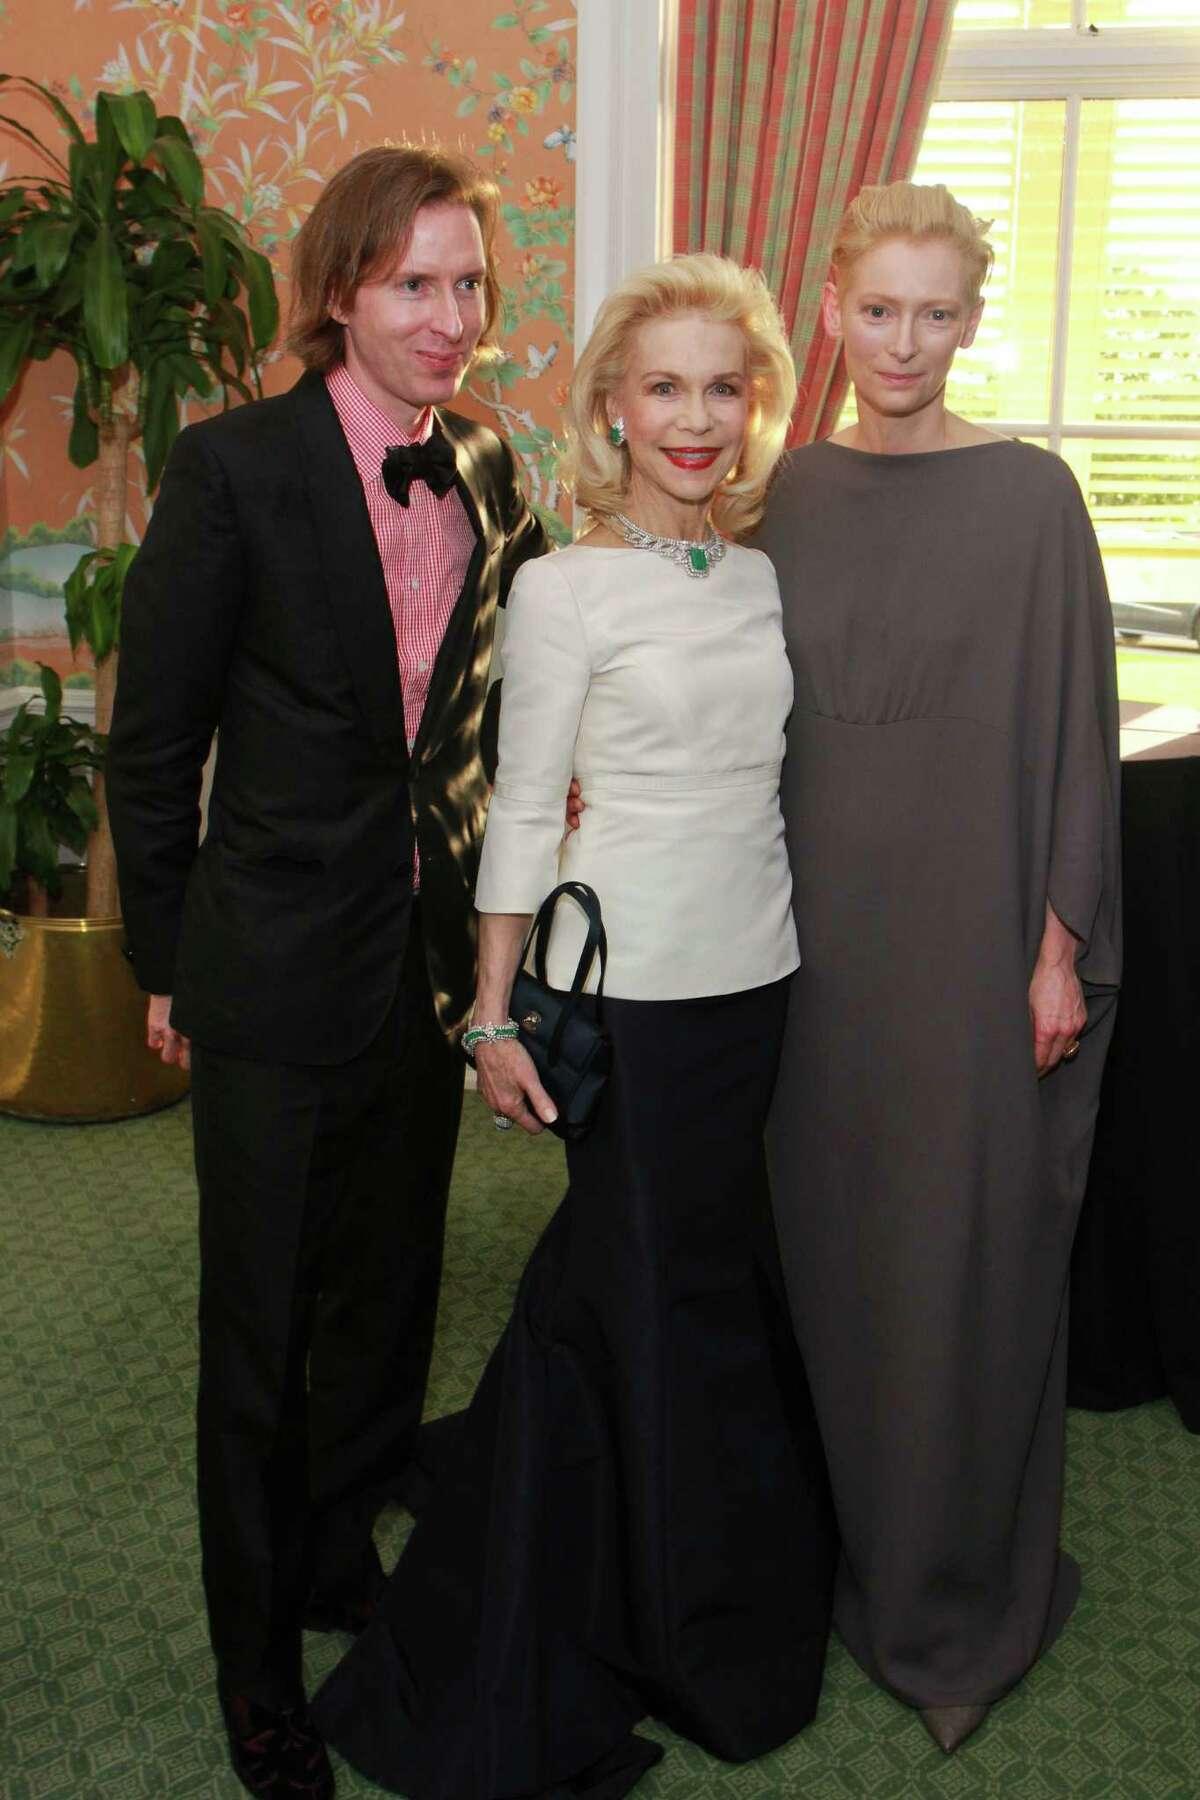 Wes Anderson, from left, Lynn Wyatt and Tilda Swinton